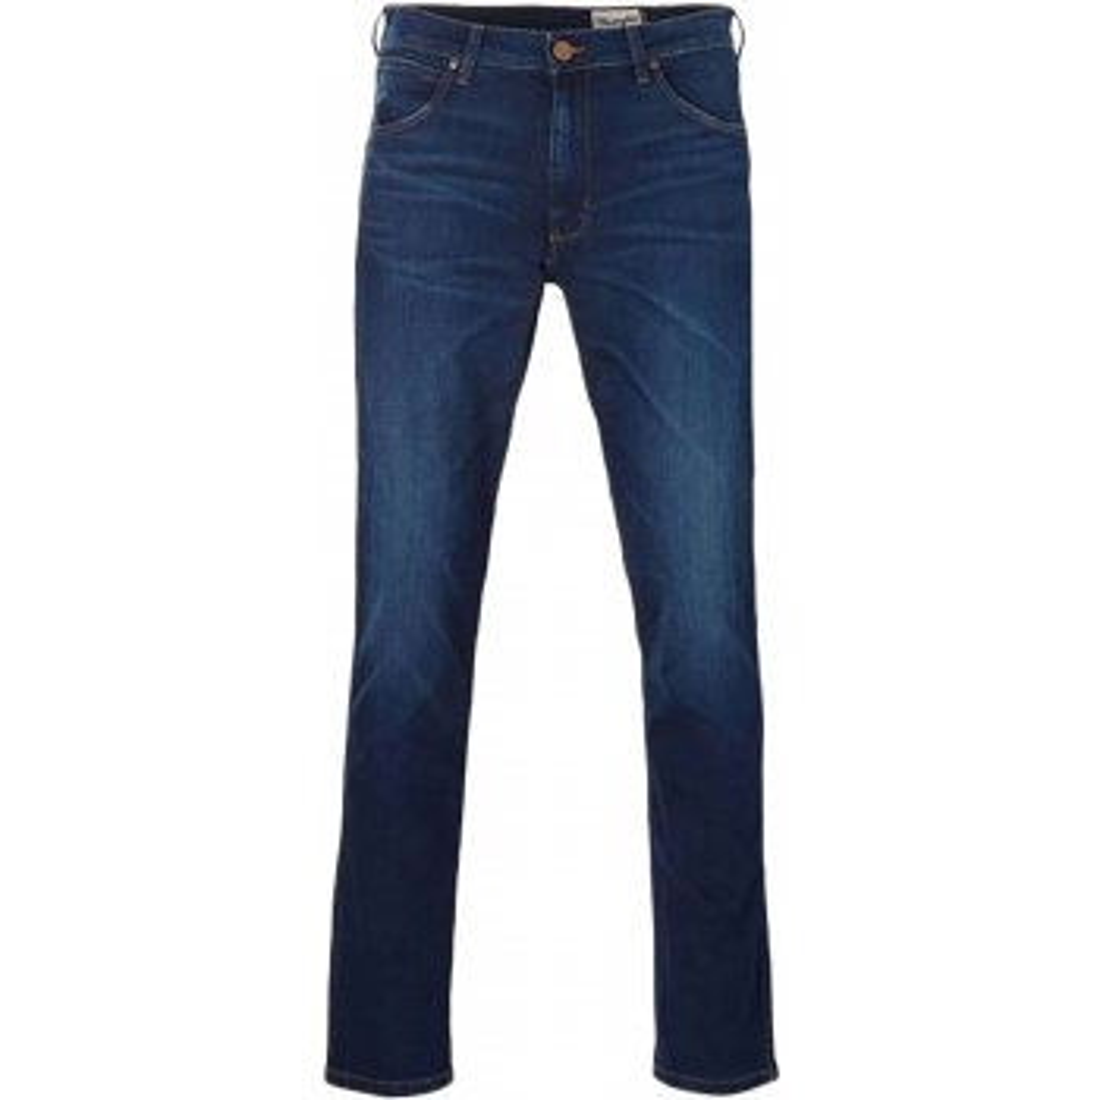 Greensboro medium blue used stretch jeans